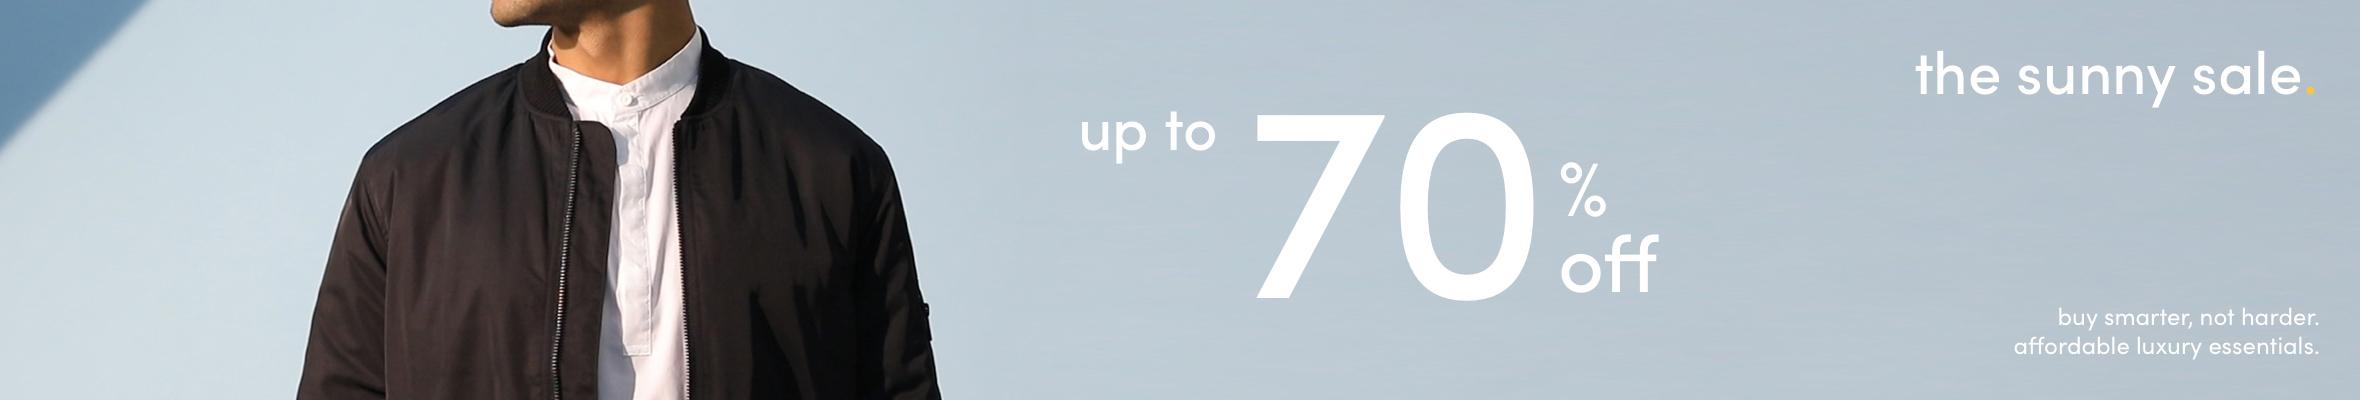 mens sunny sale 70